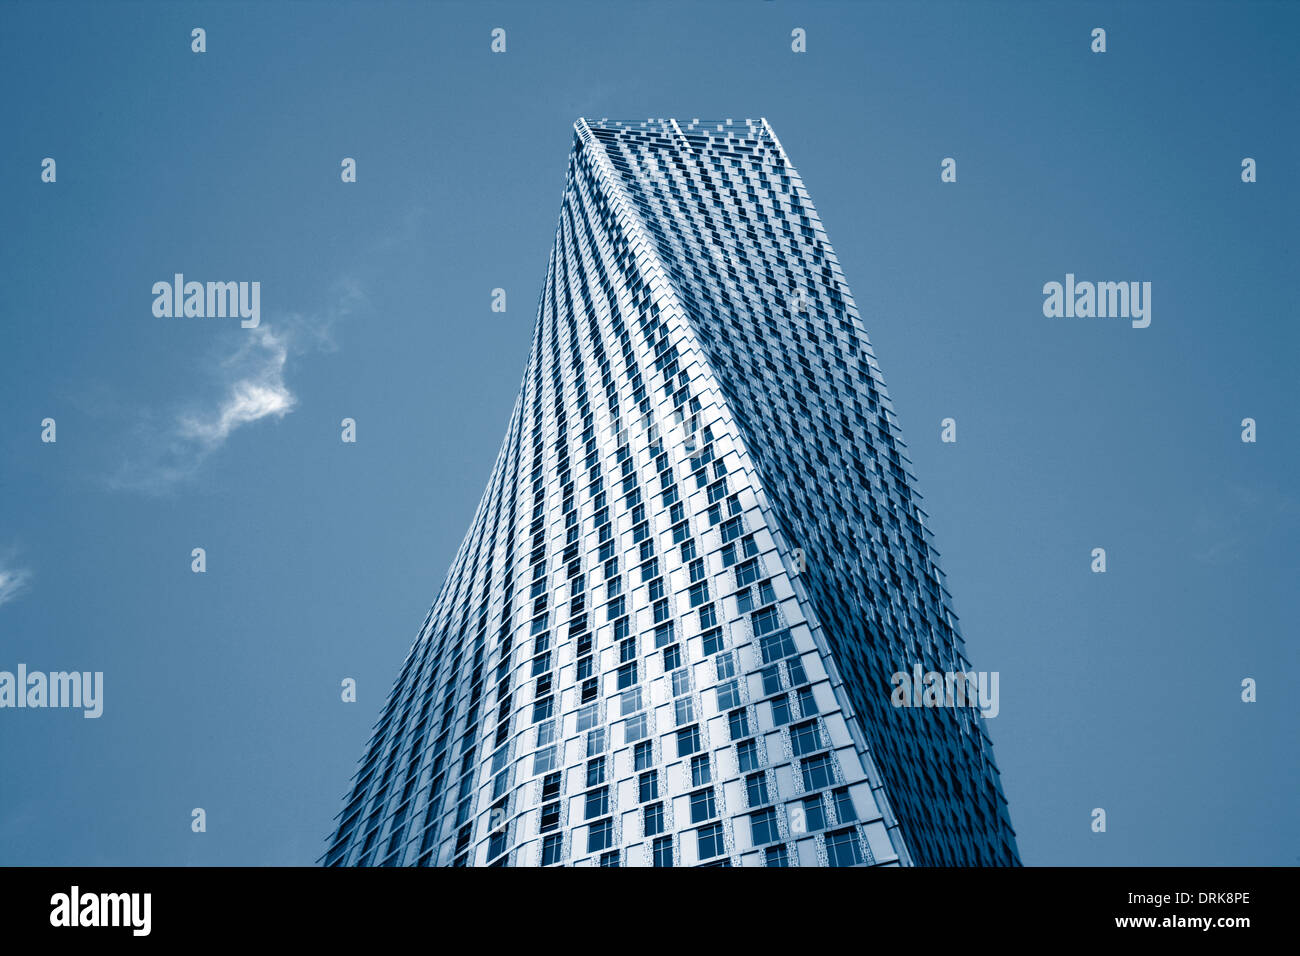 Twisted tower, Dubai Marina (Cayan tower). - Stock Image